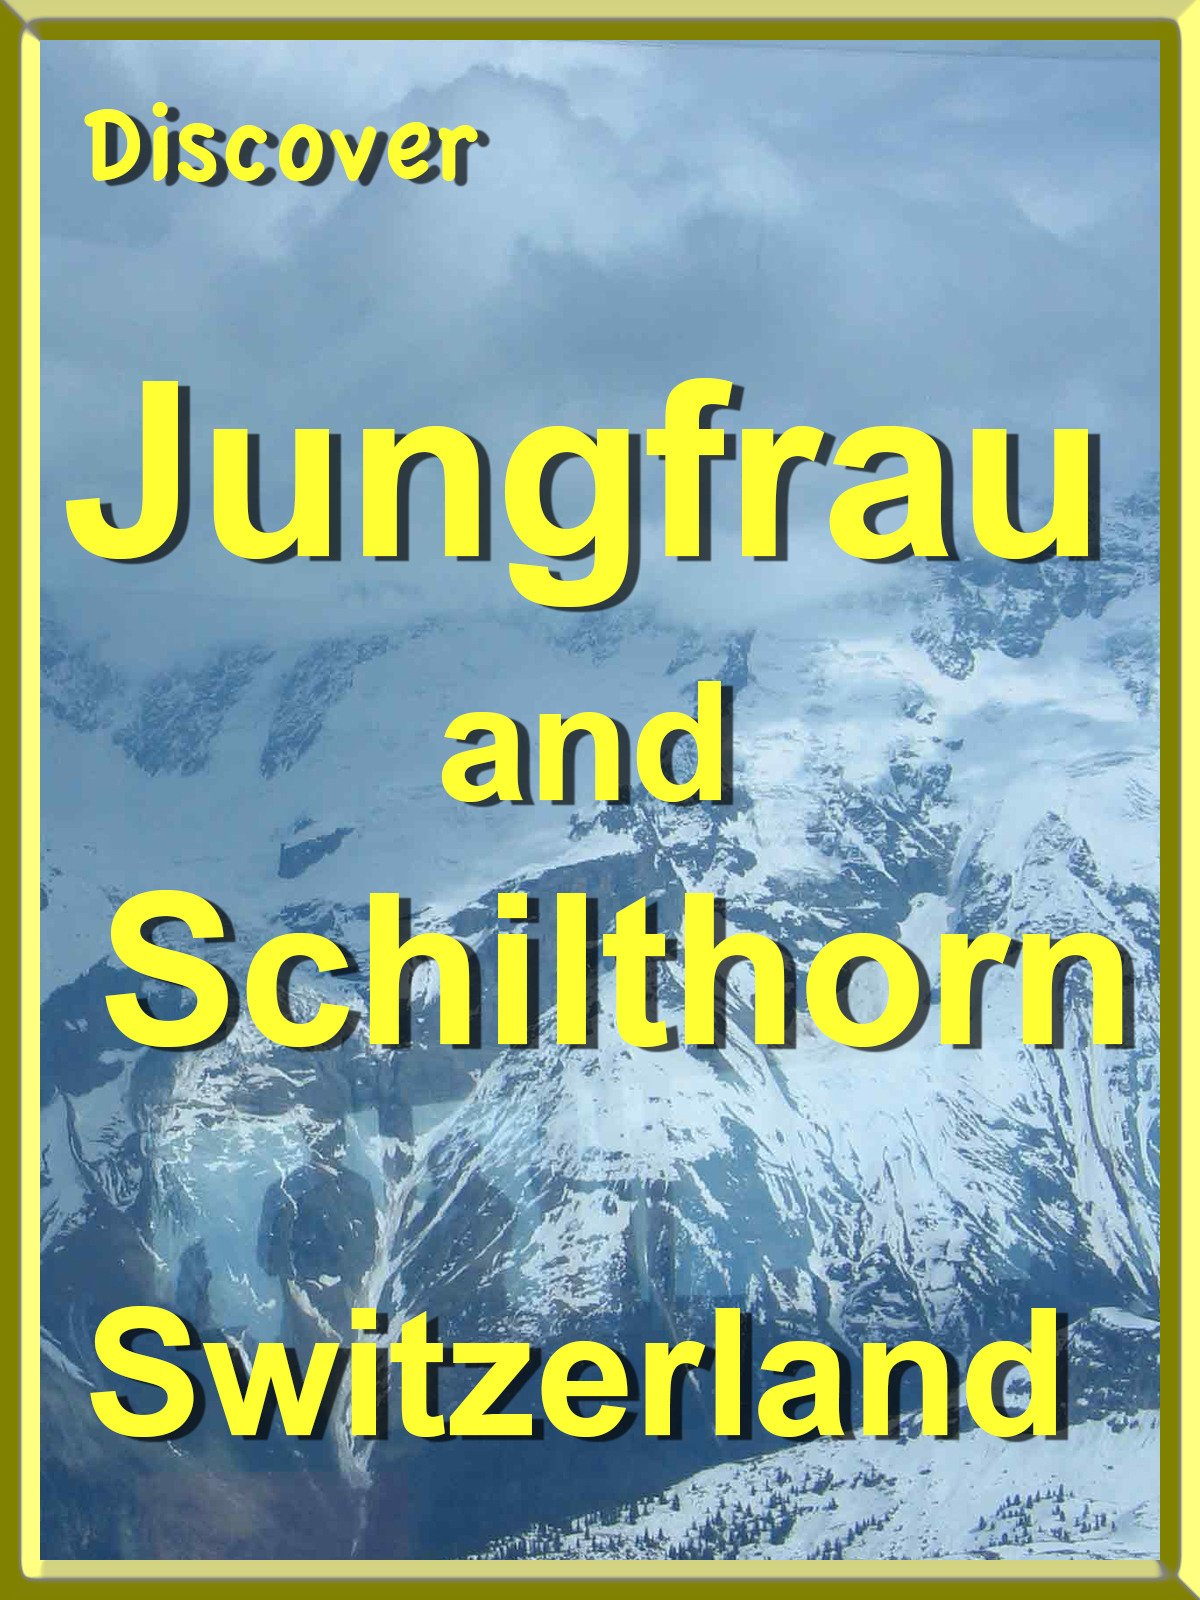 Discover Jungfrau and Schilthorn, Switzerland